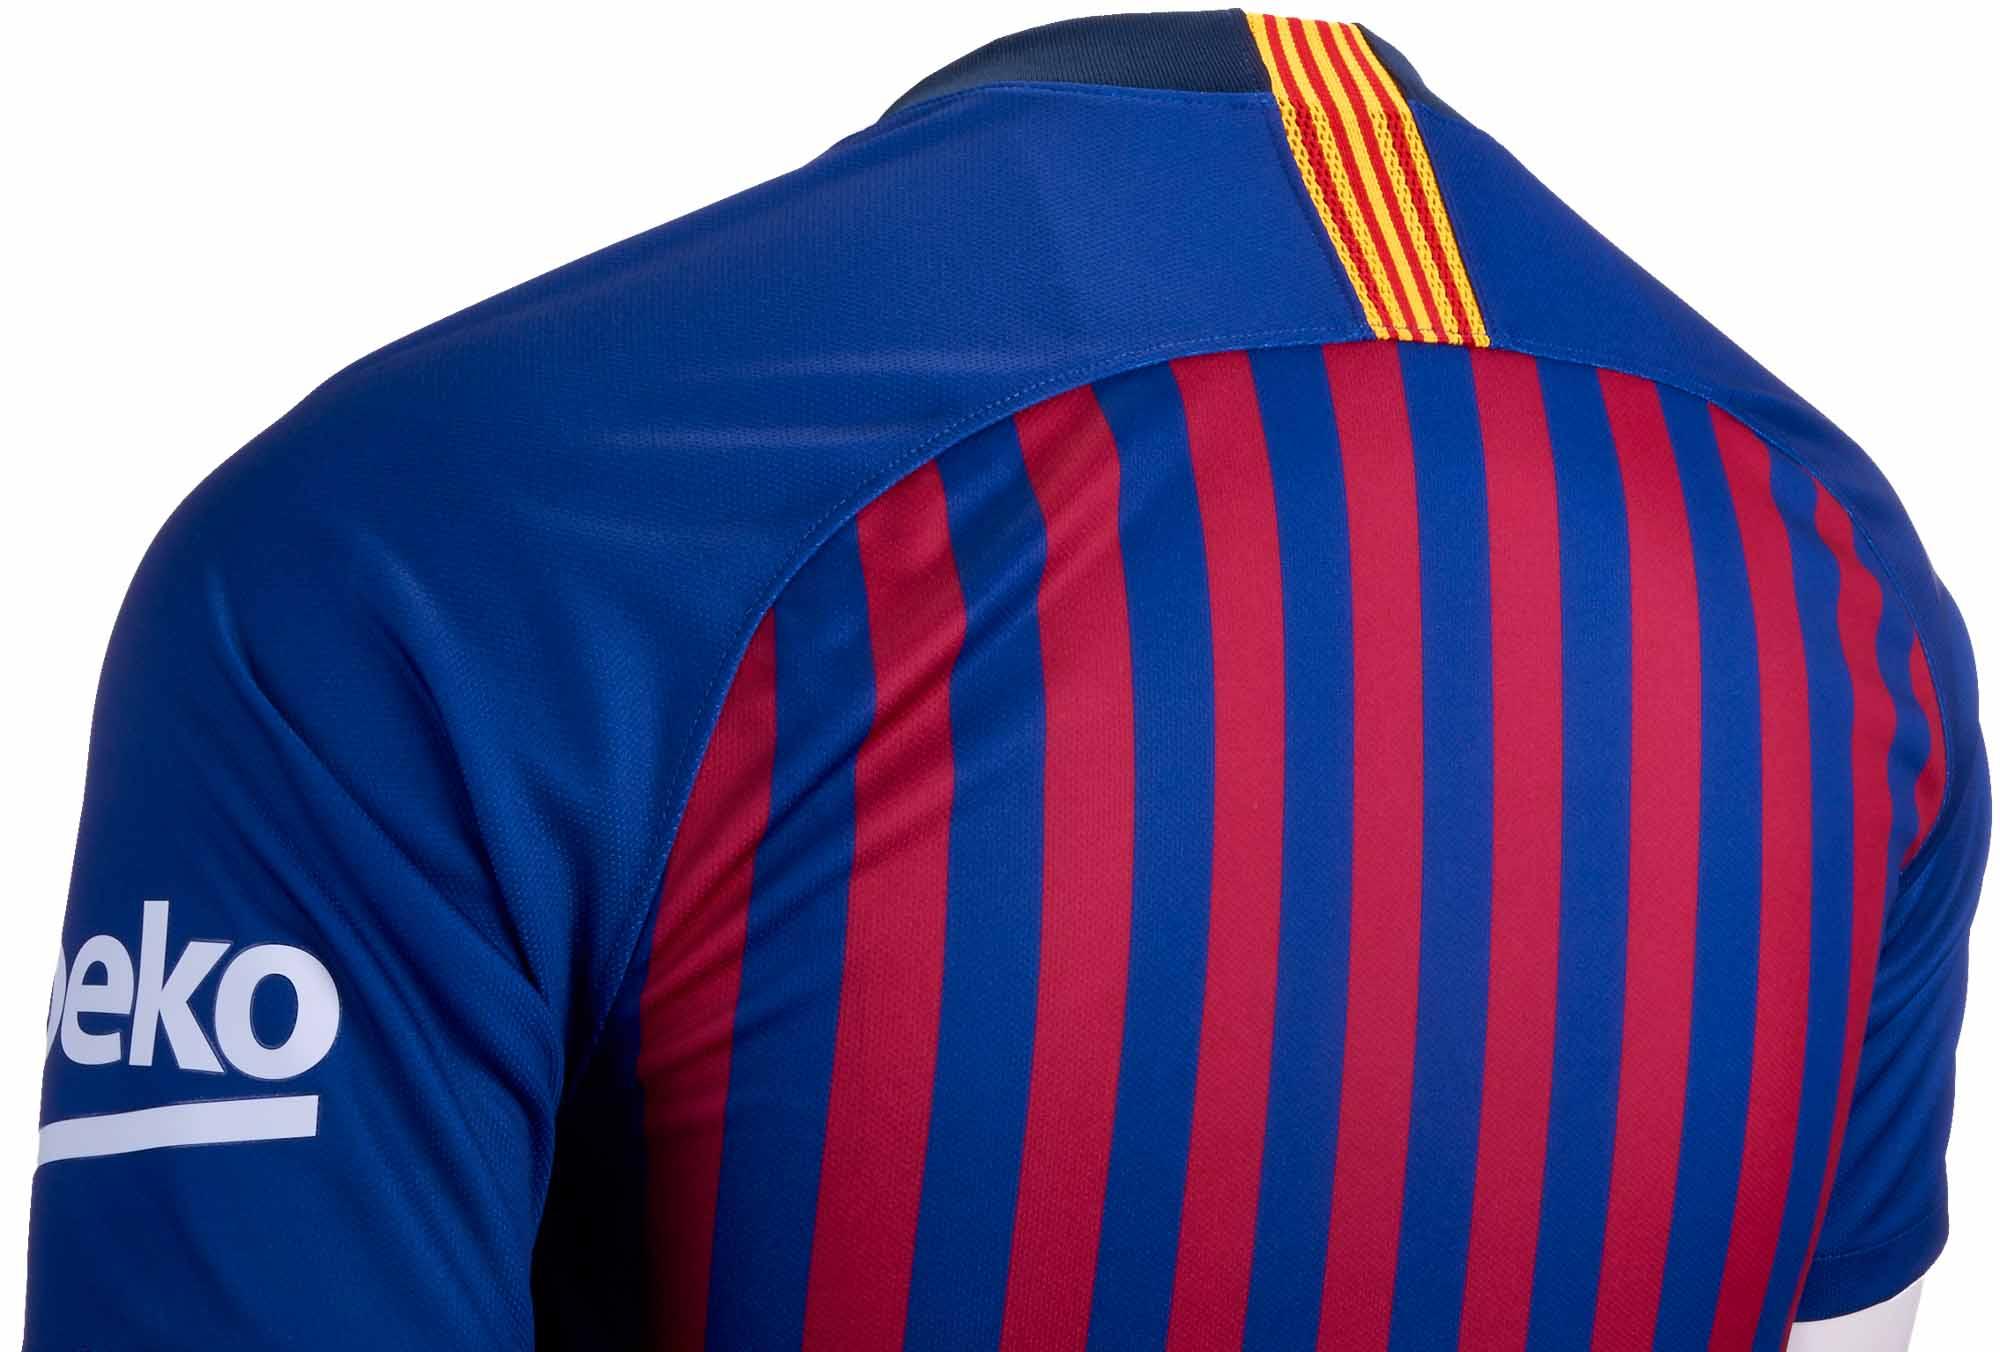 0e90f40a6 Enjoy Free Shipping Spain Adidas Kids Away Football Shirt 2018/19